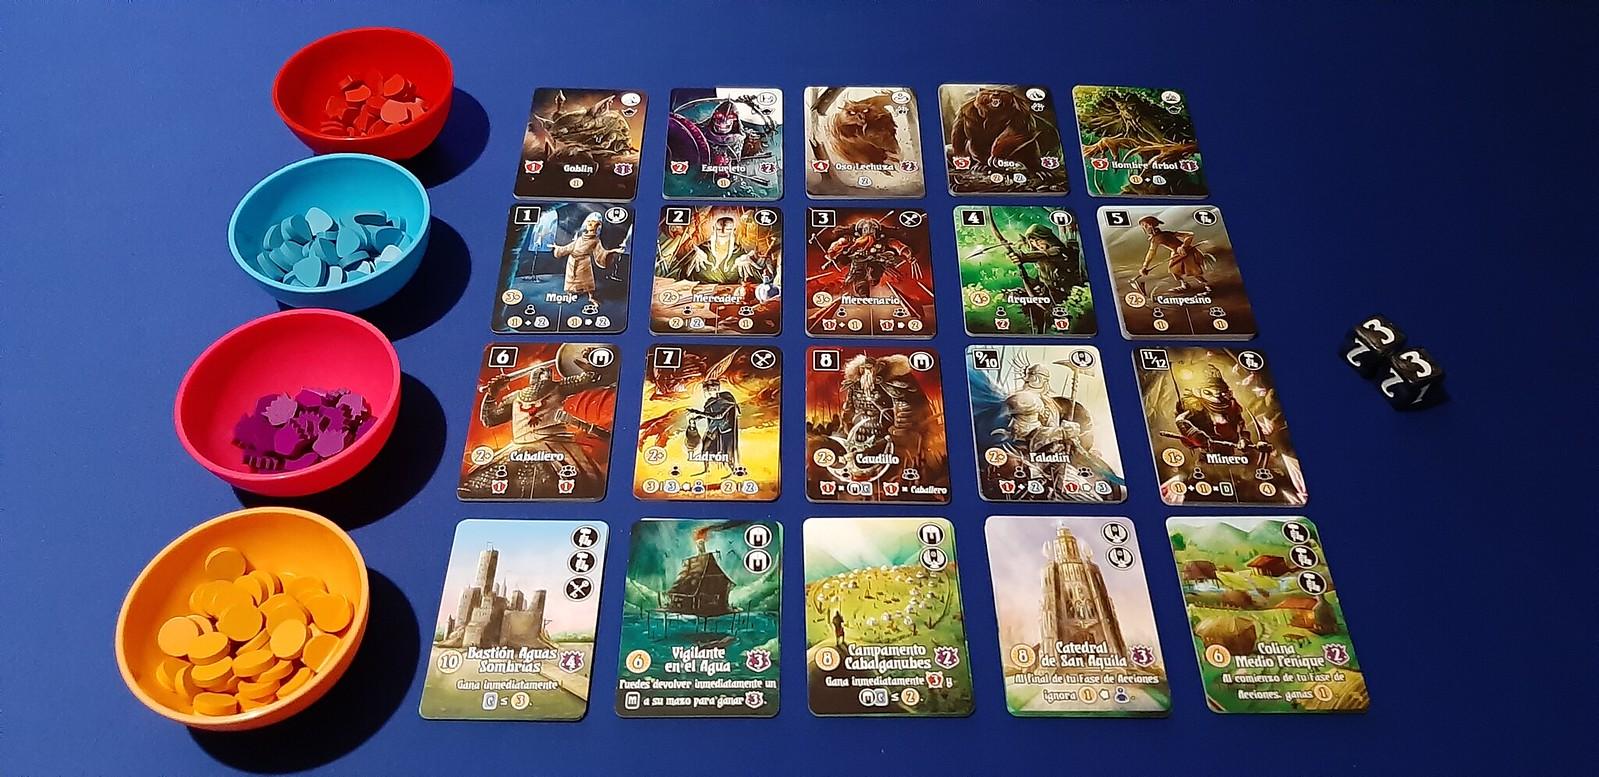 Valeria Reino de Cartas juego de mesa